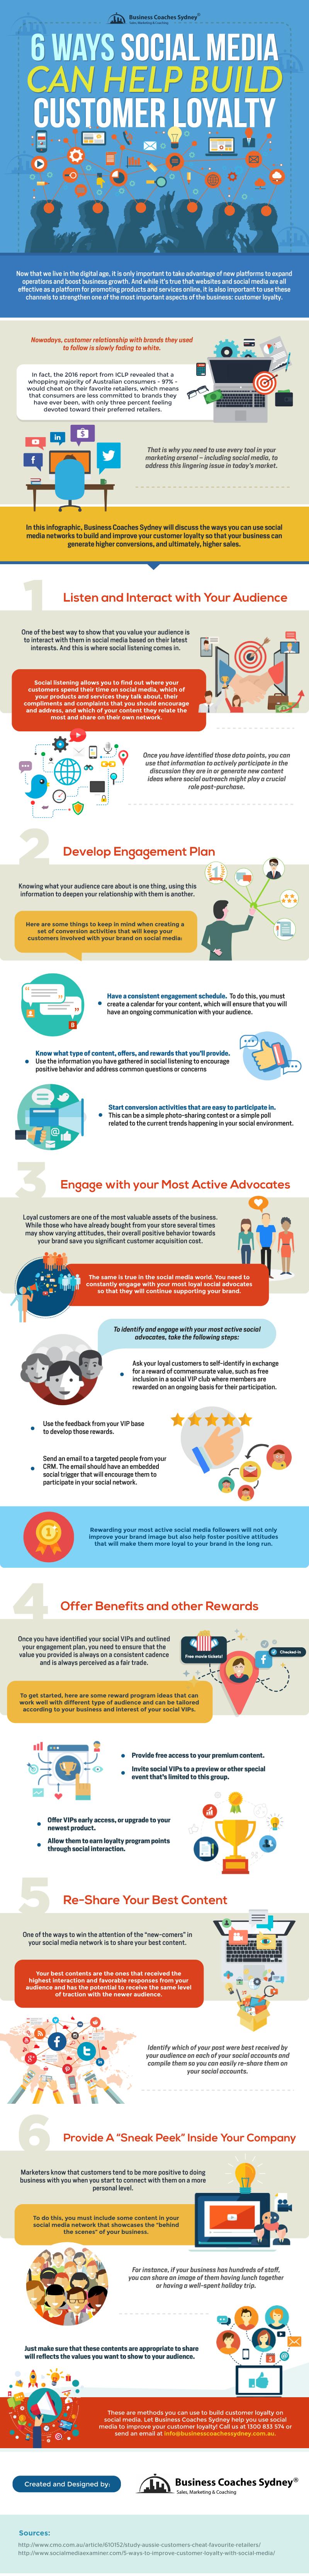 6 Ways Social Media Can Help Build Customer Loyalty [Infographic]   Social Media Today